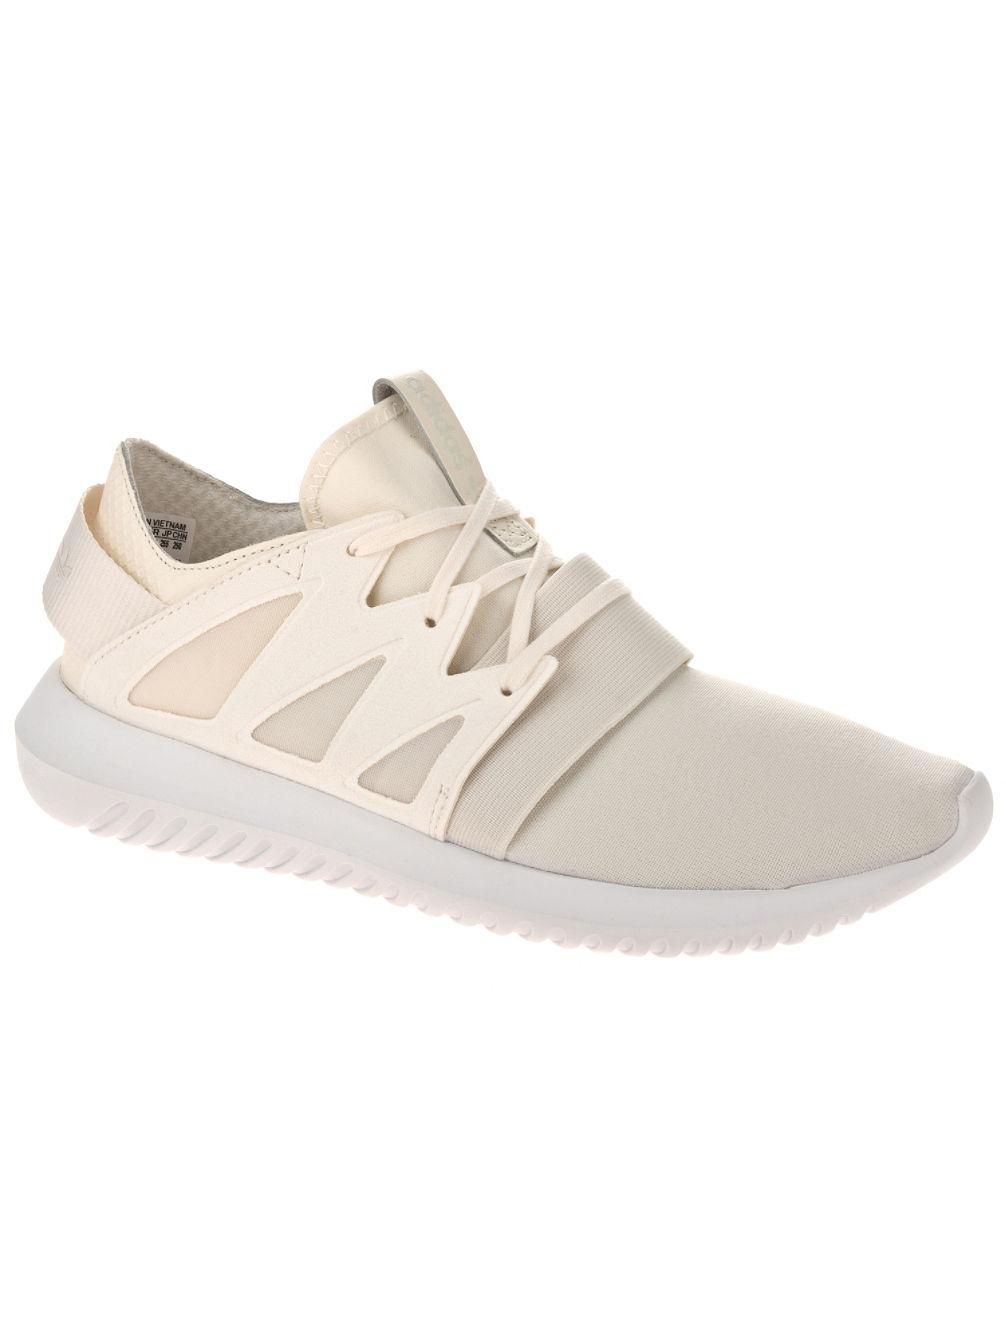 purchase cheap f4bee 6ed4c adidas Originals Tubular Viral Sneakers Women